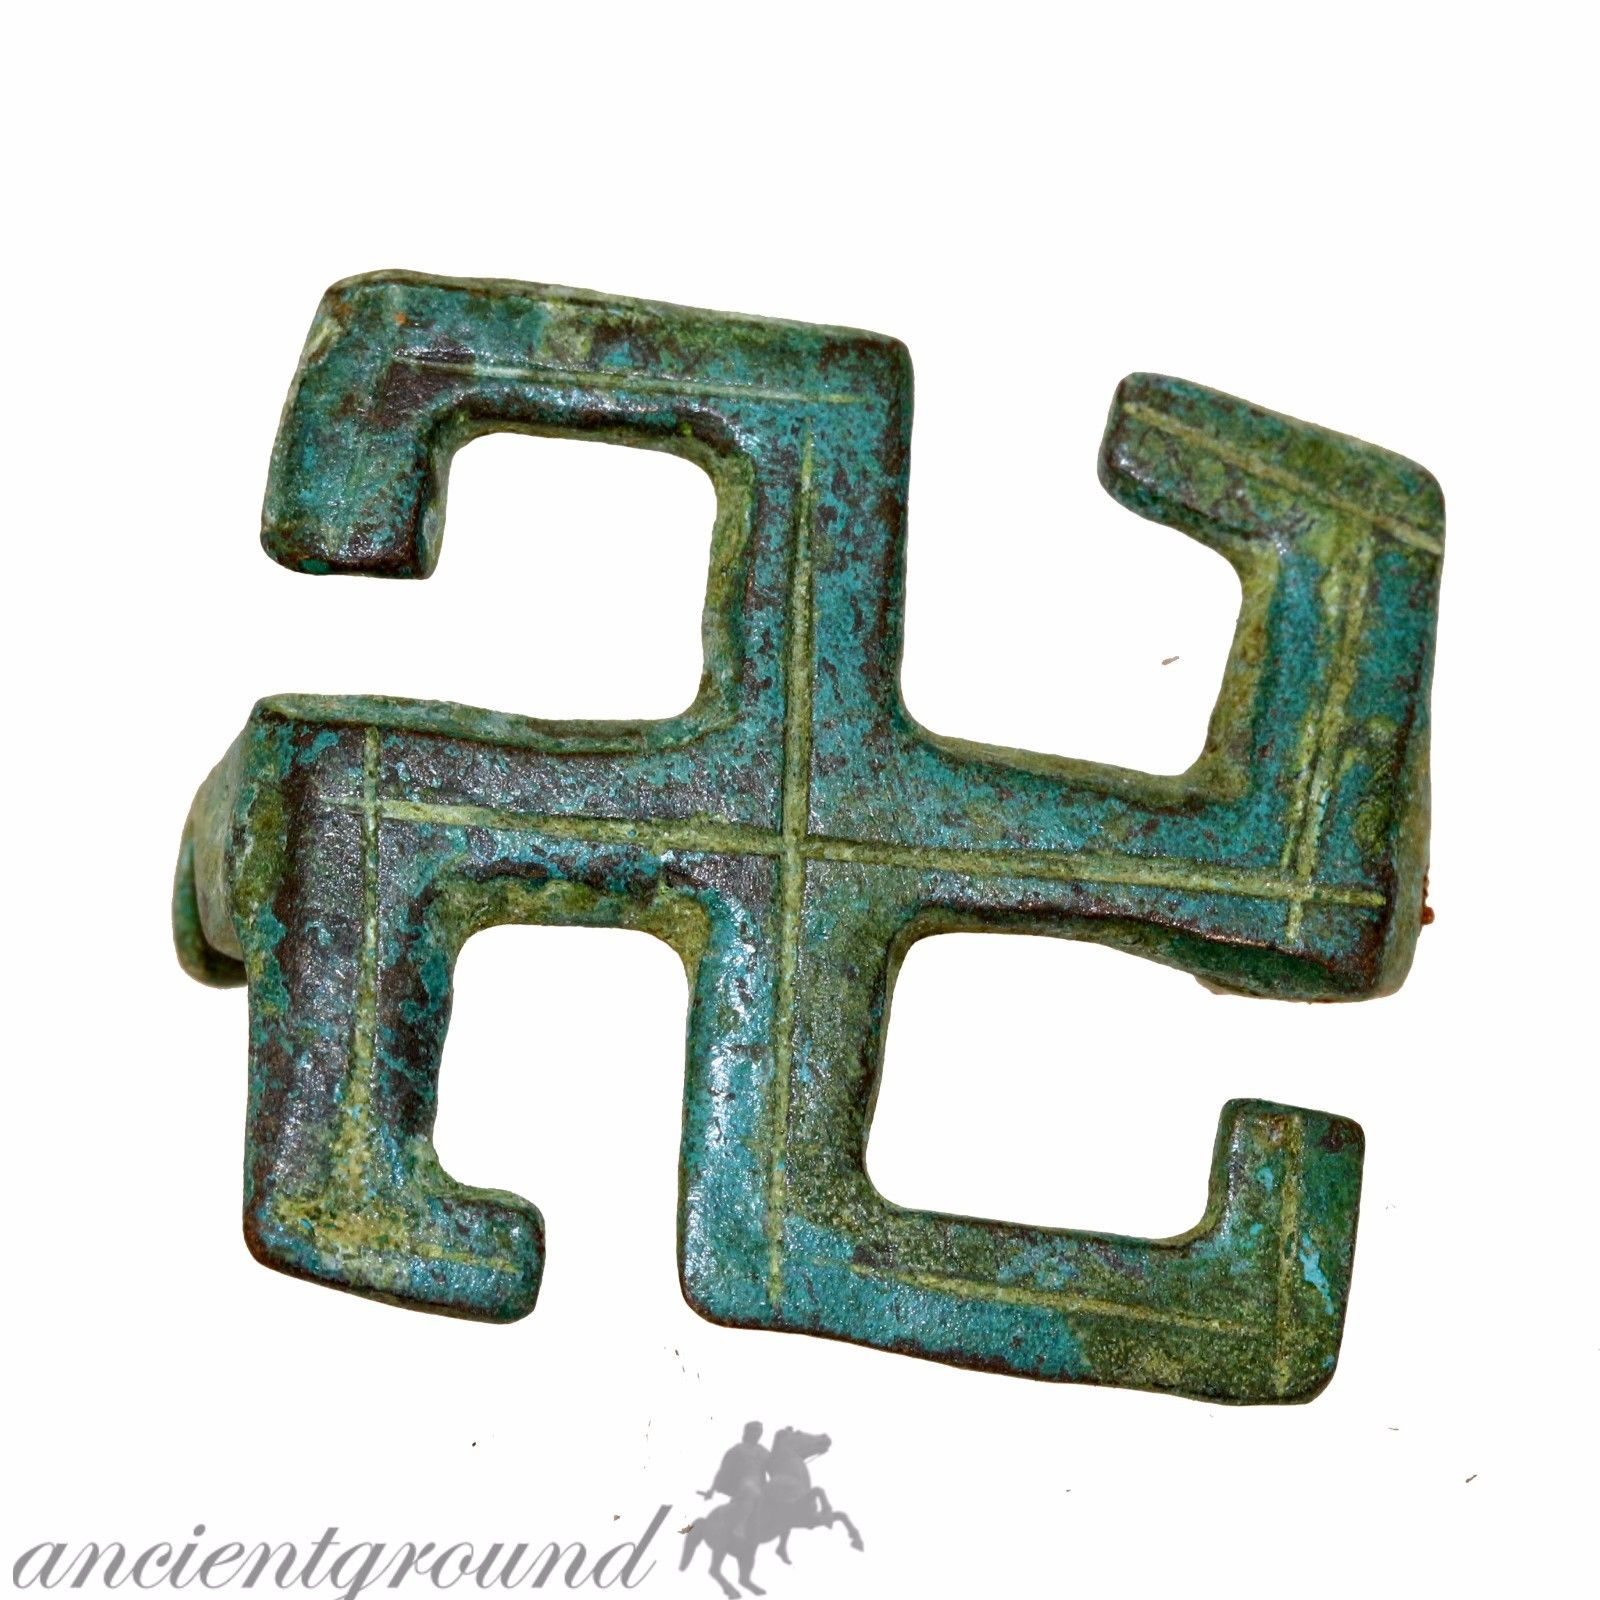 Very-Rare-Roman-Bronze-Swastika-Fibula-Brooch-Circa.jpg